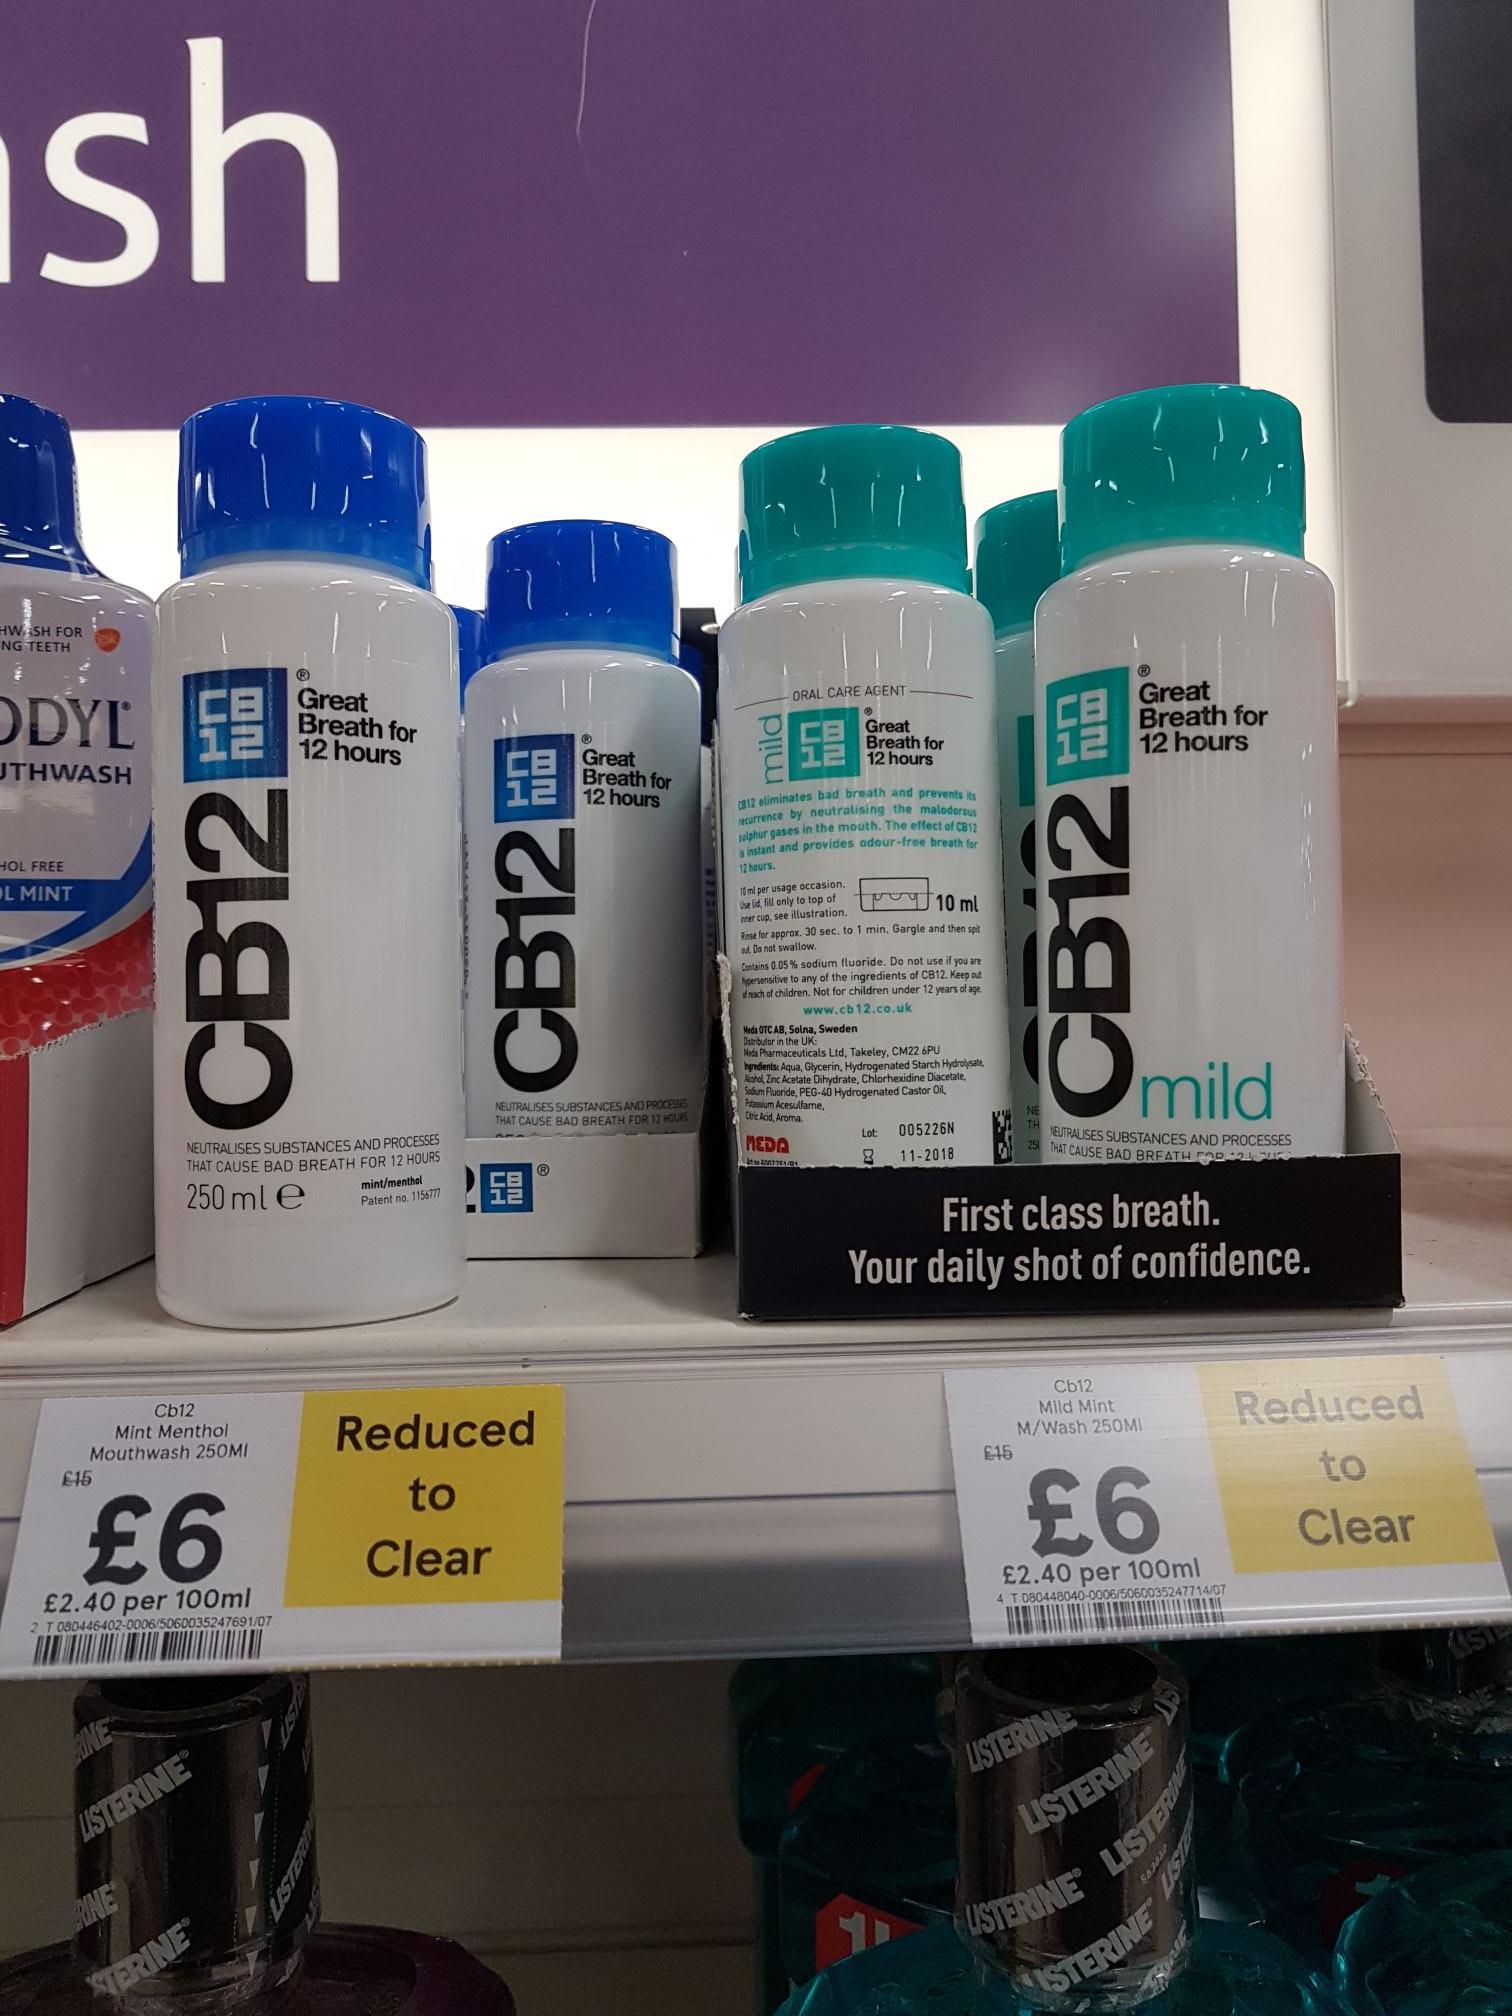 CB12 Mouthwash 250ml £6 Tesco